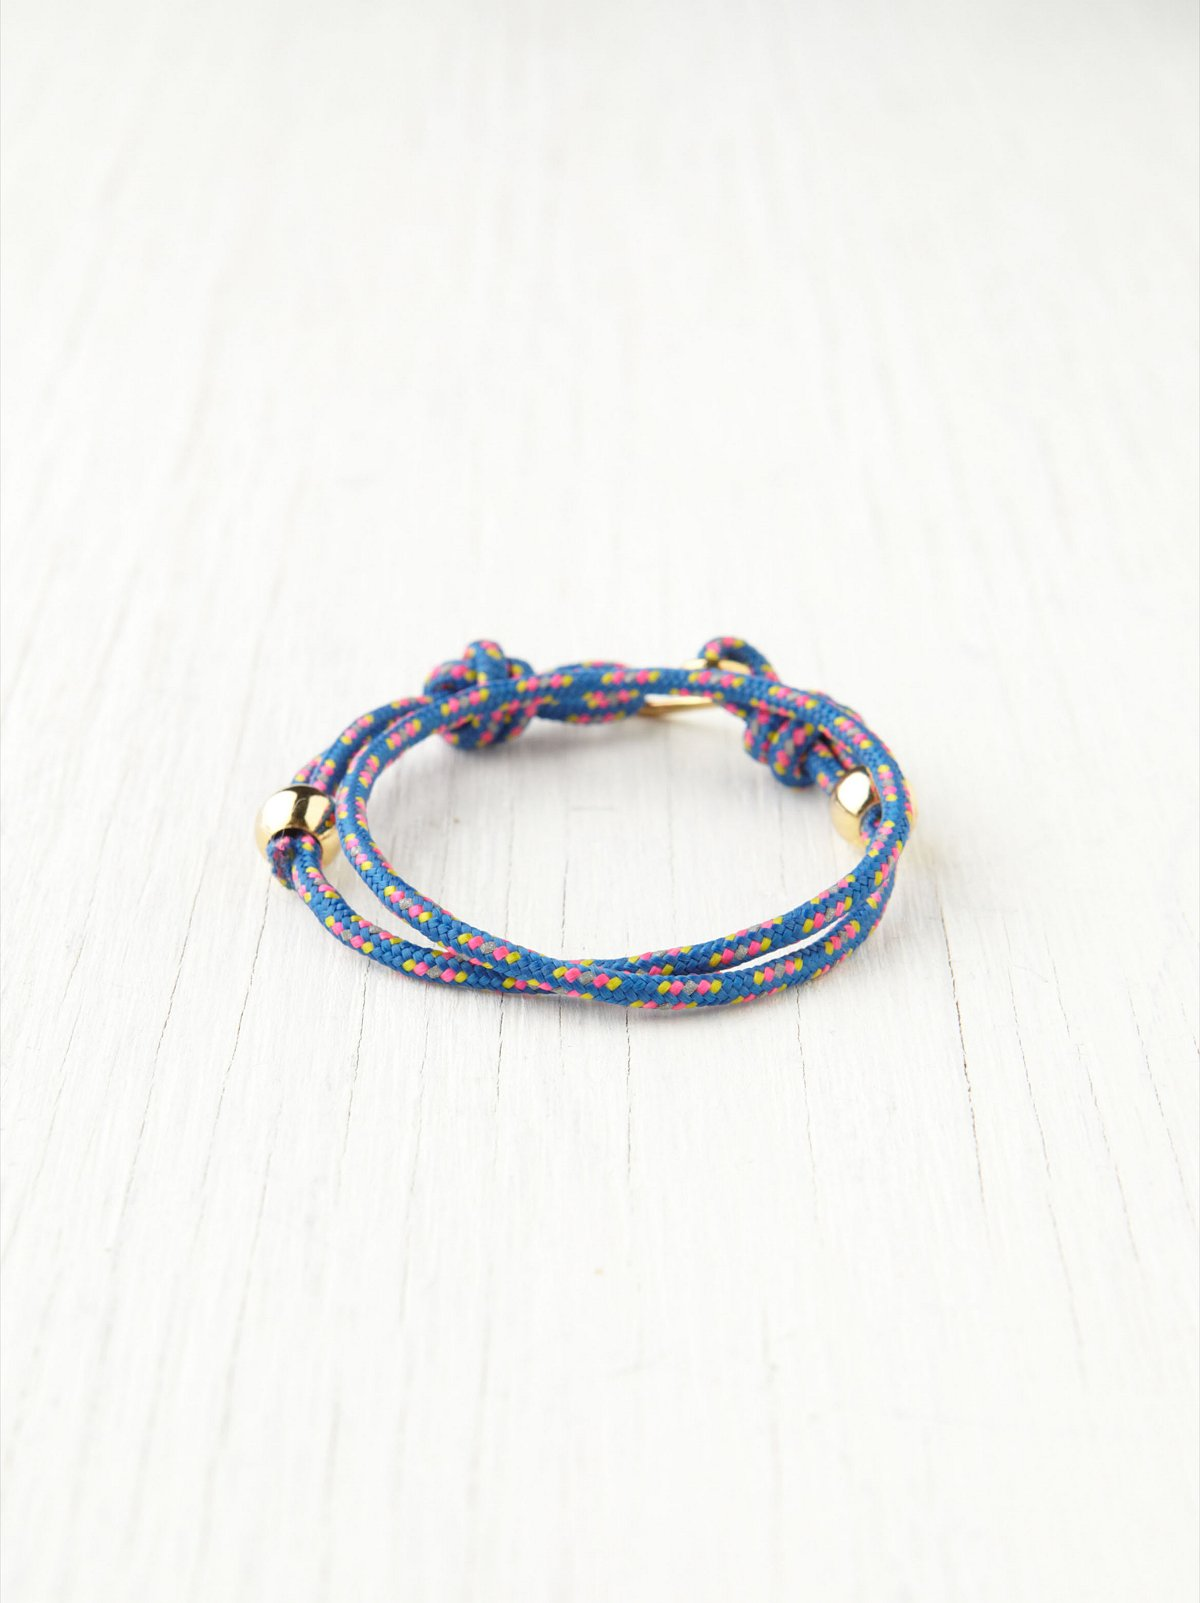 Coral Springs Wrap Bracelet